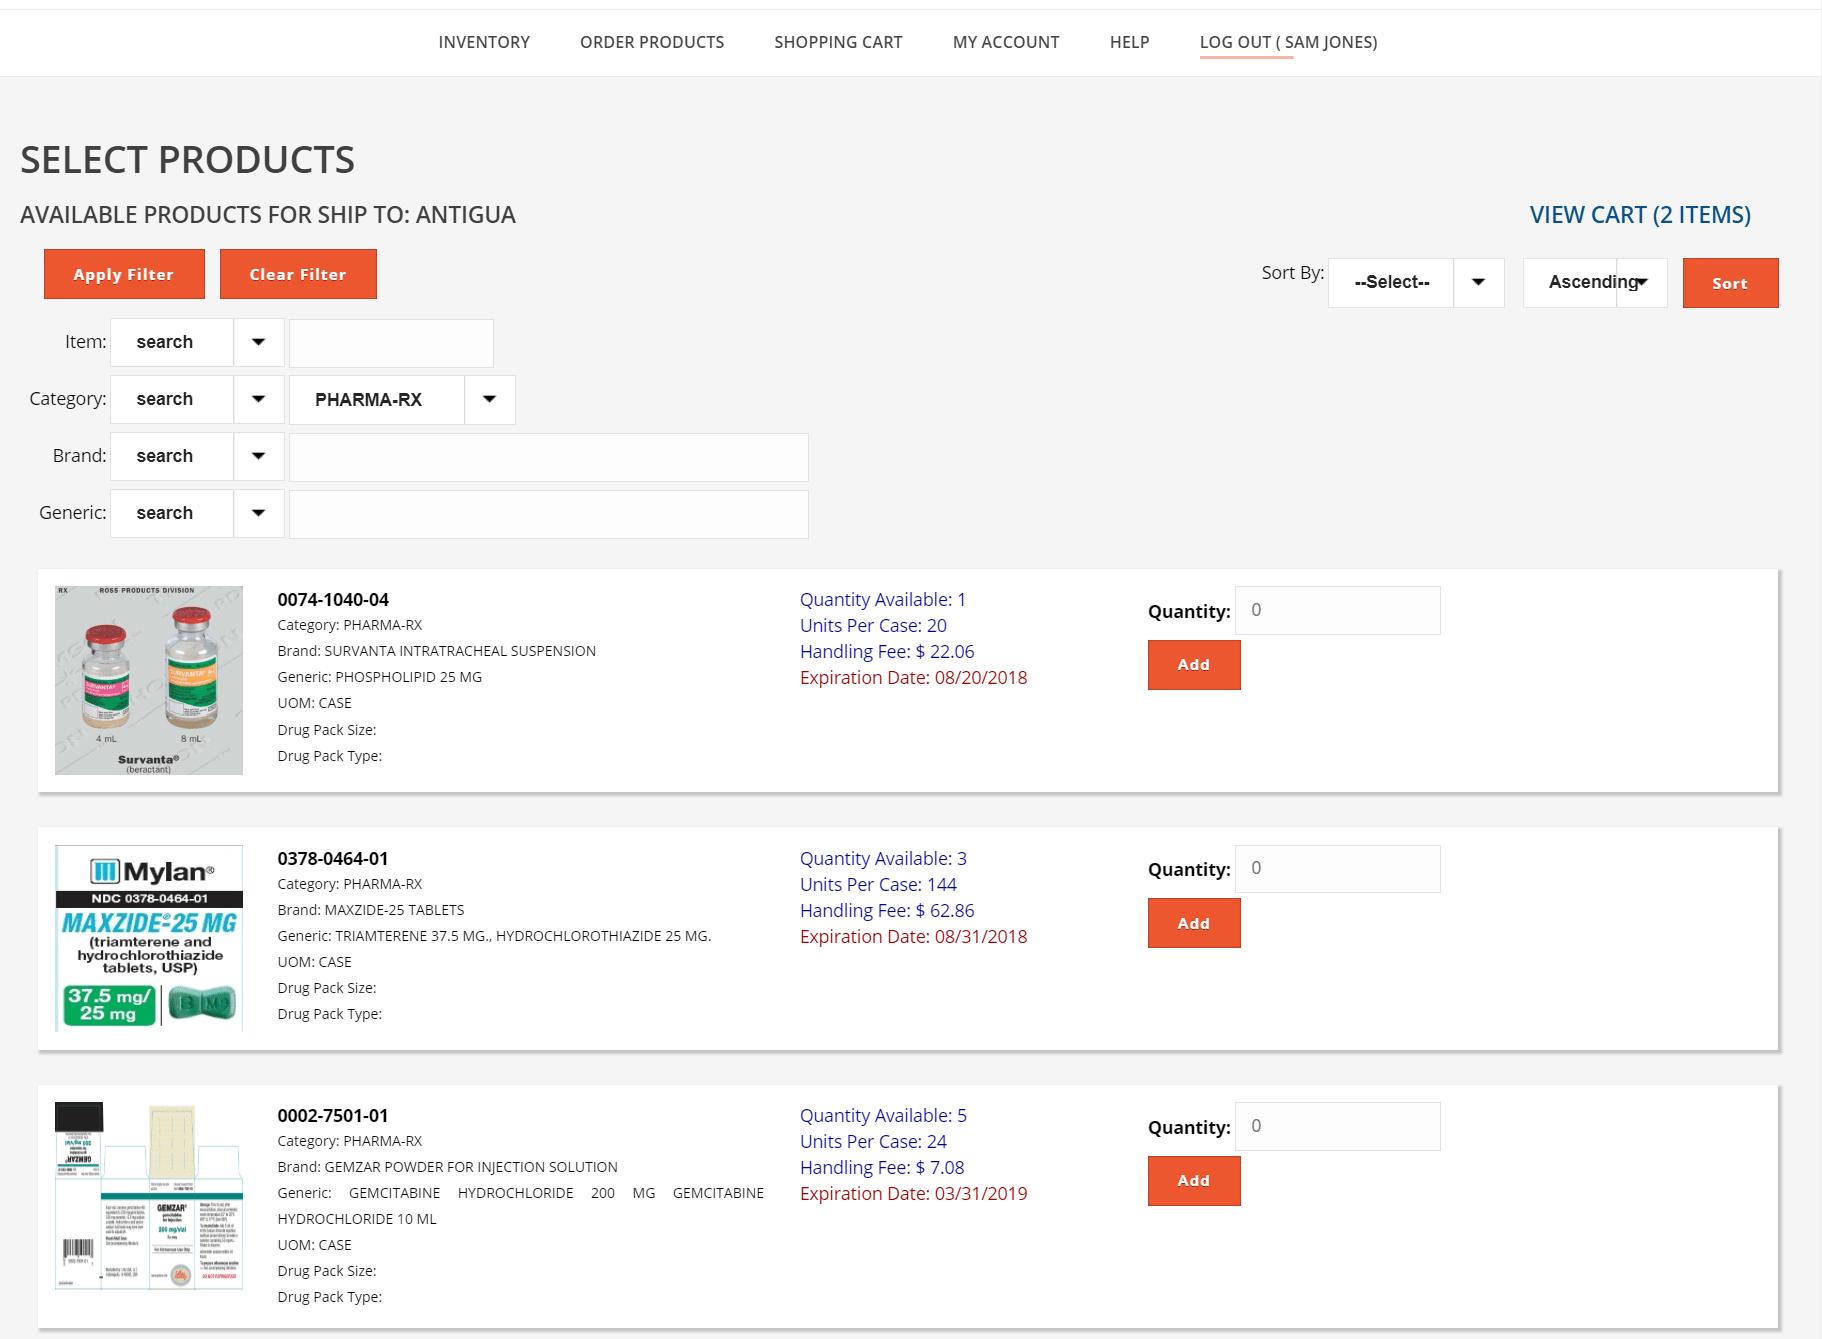 portaldemo-select-products-1